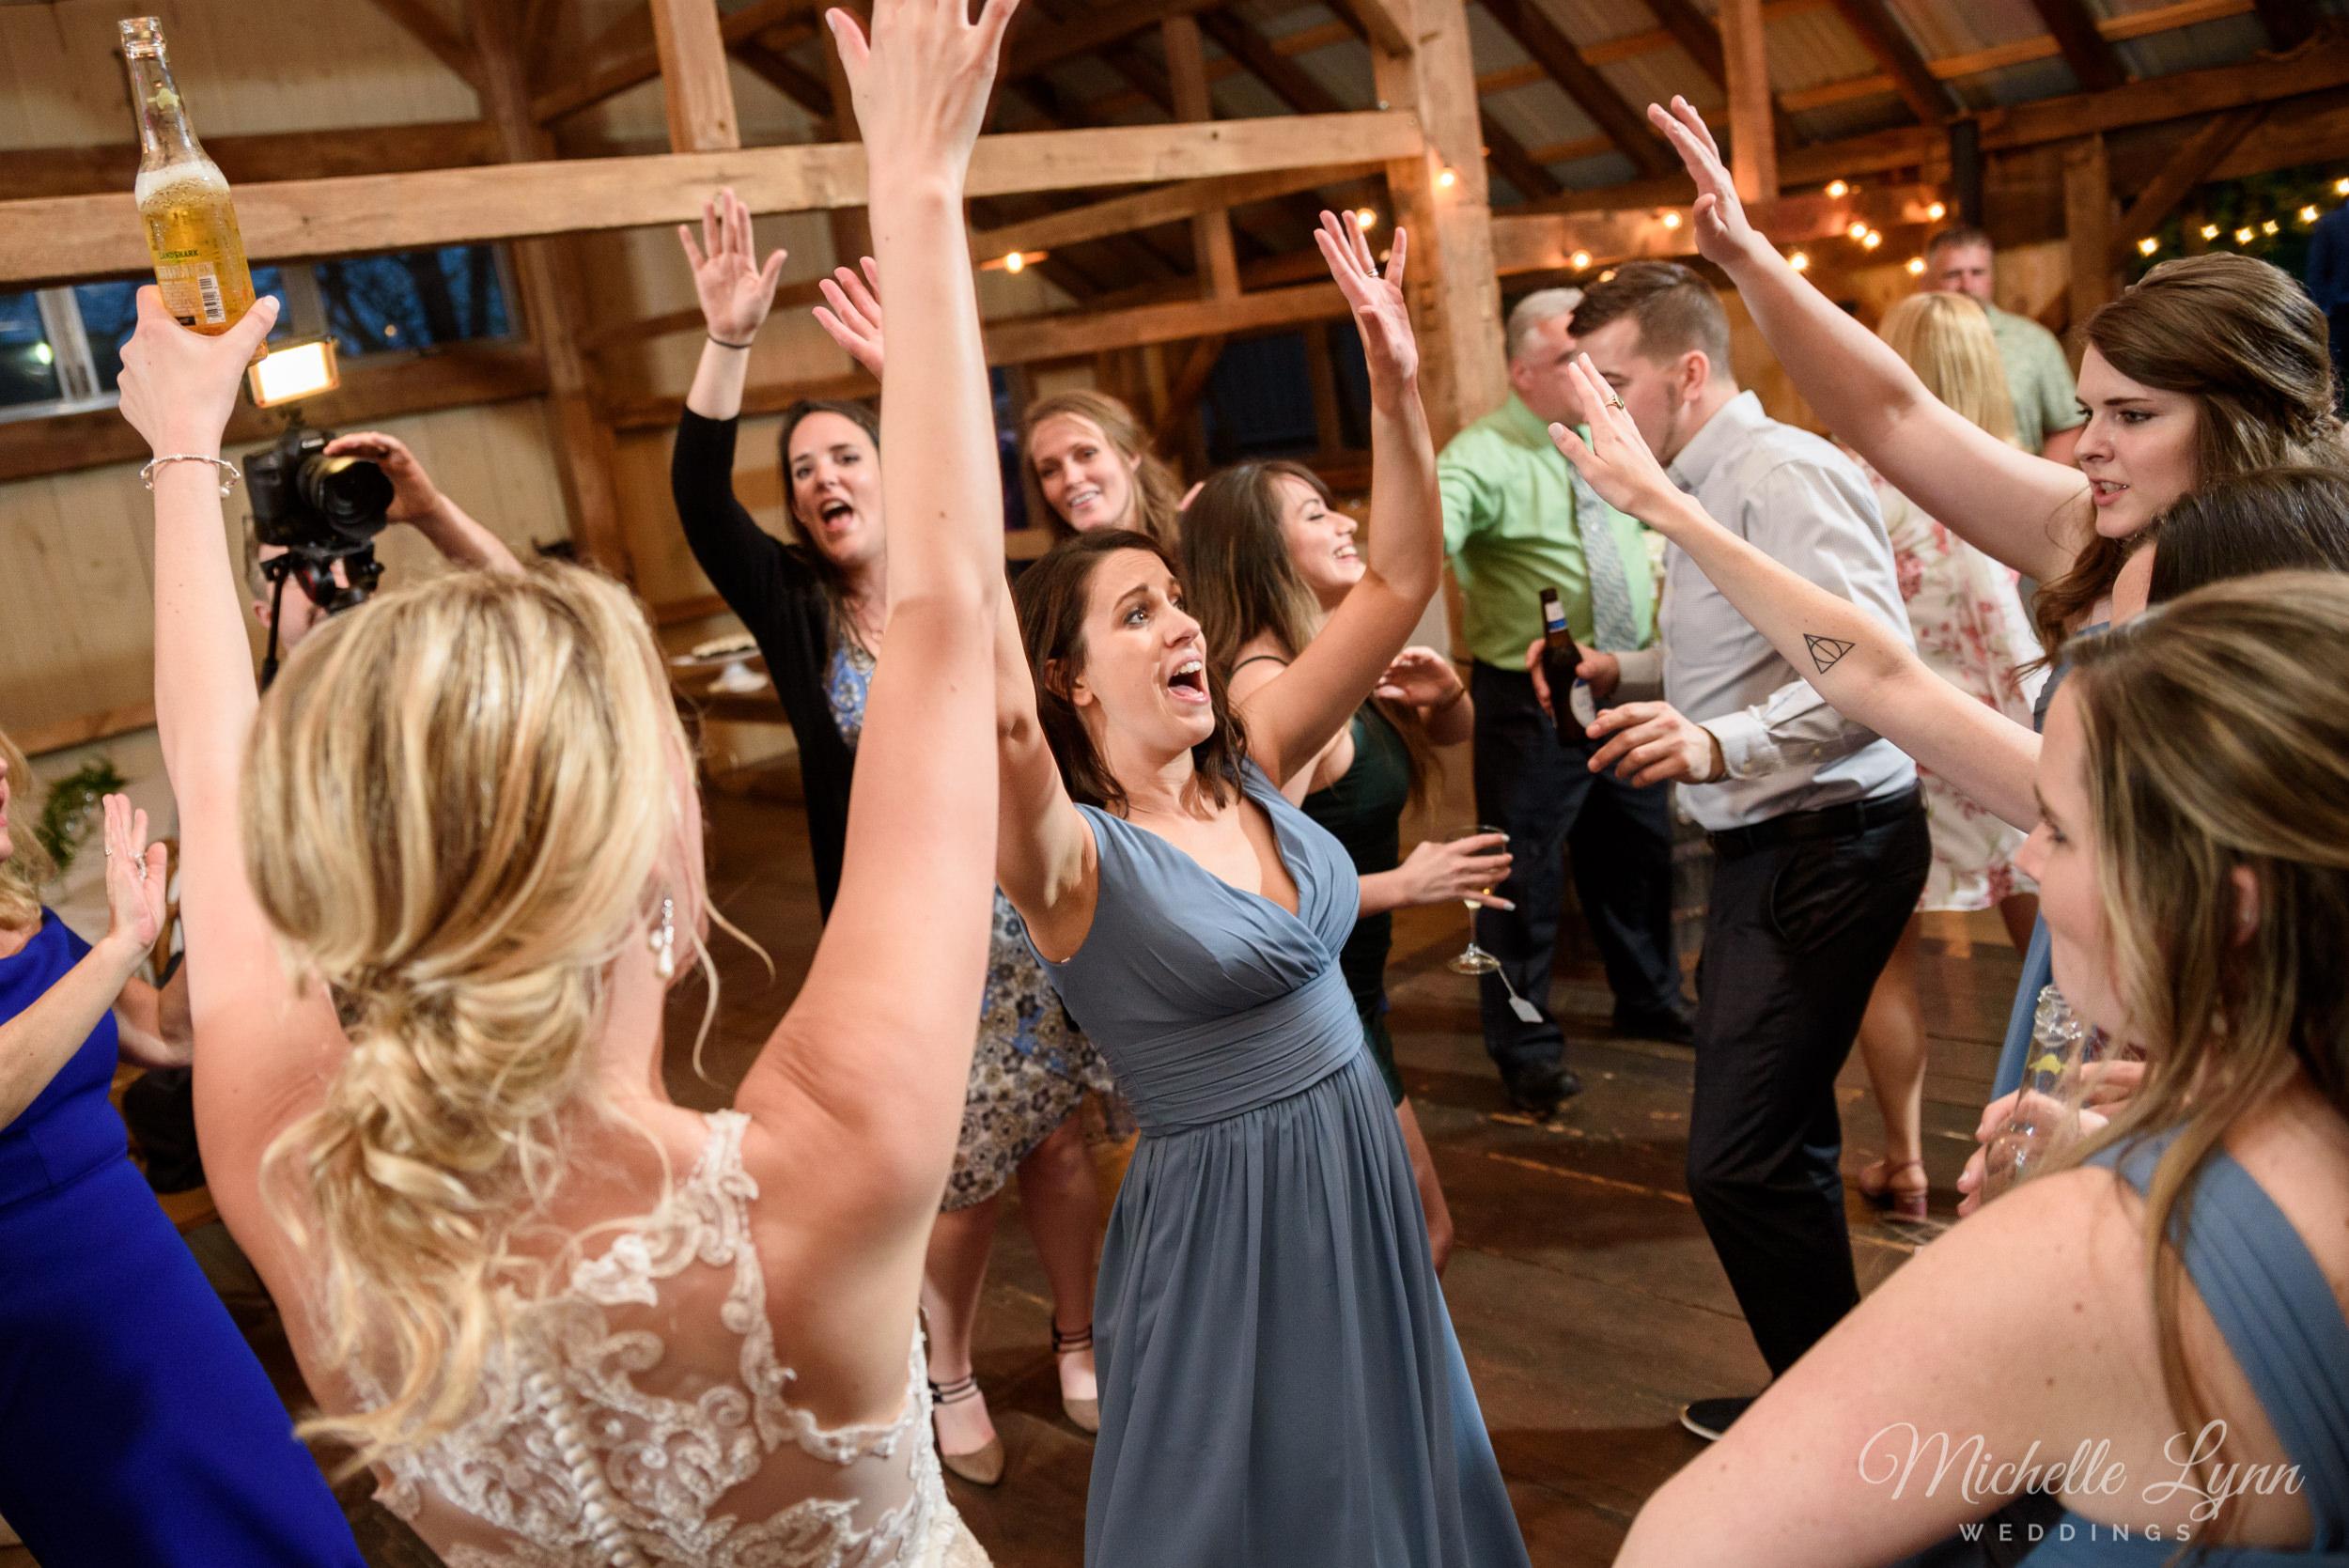 mlw-the-farm-bakery-and-events-wedding-photos-76.jpg